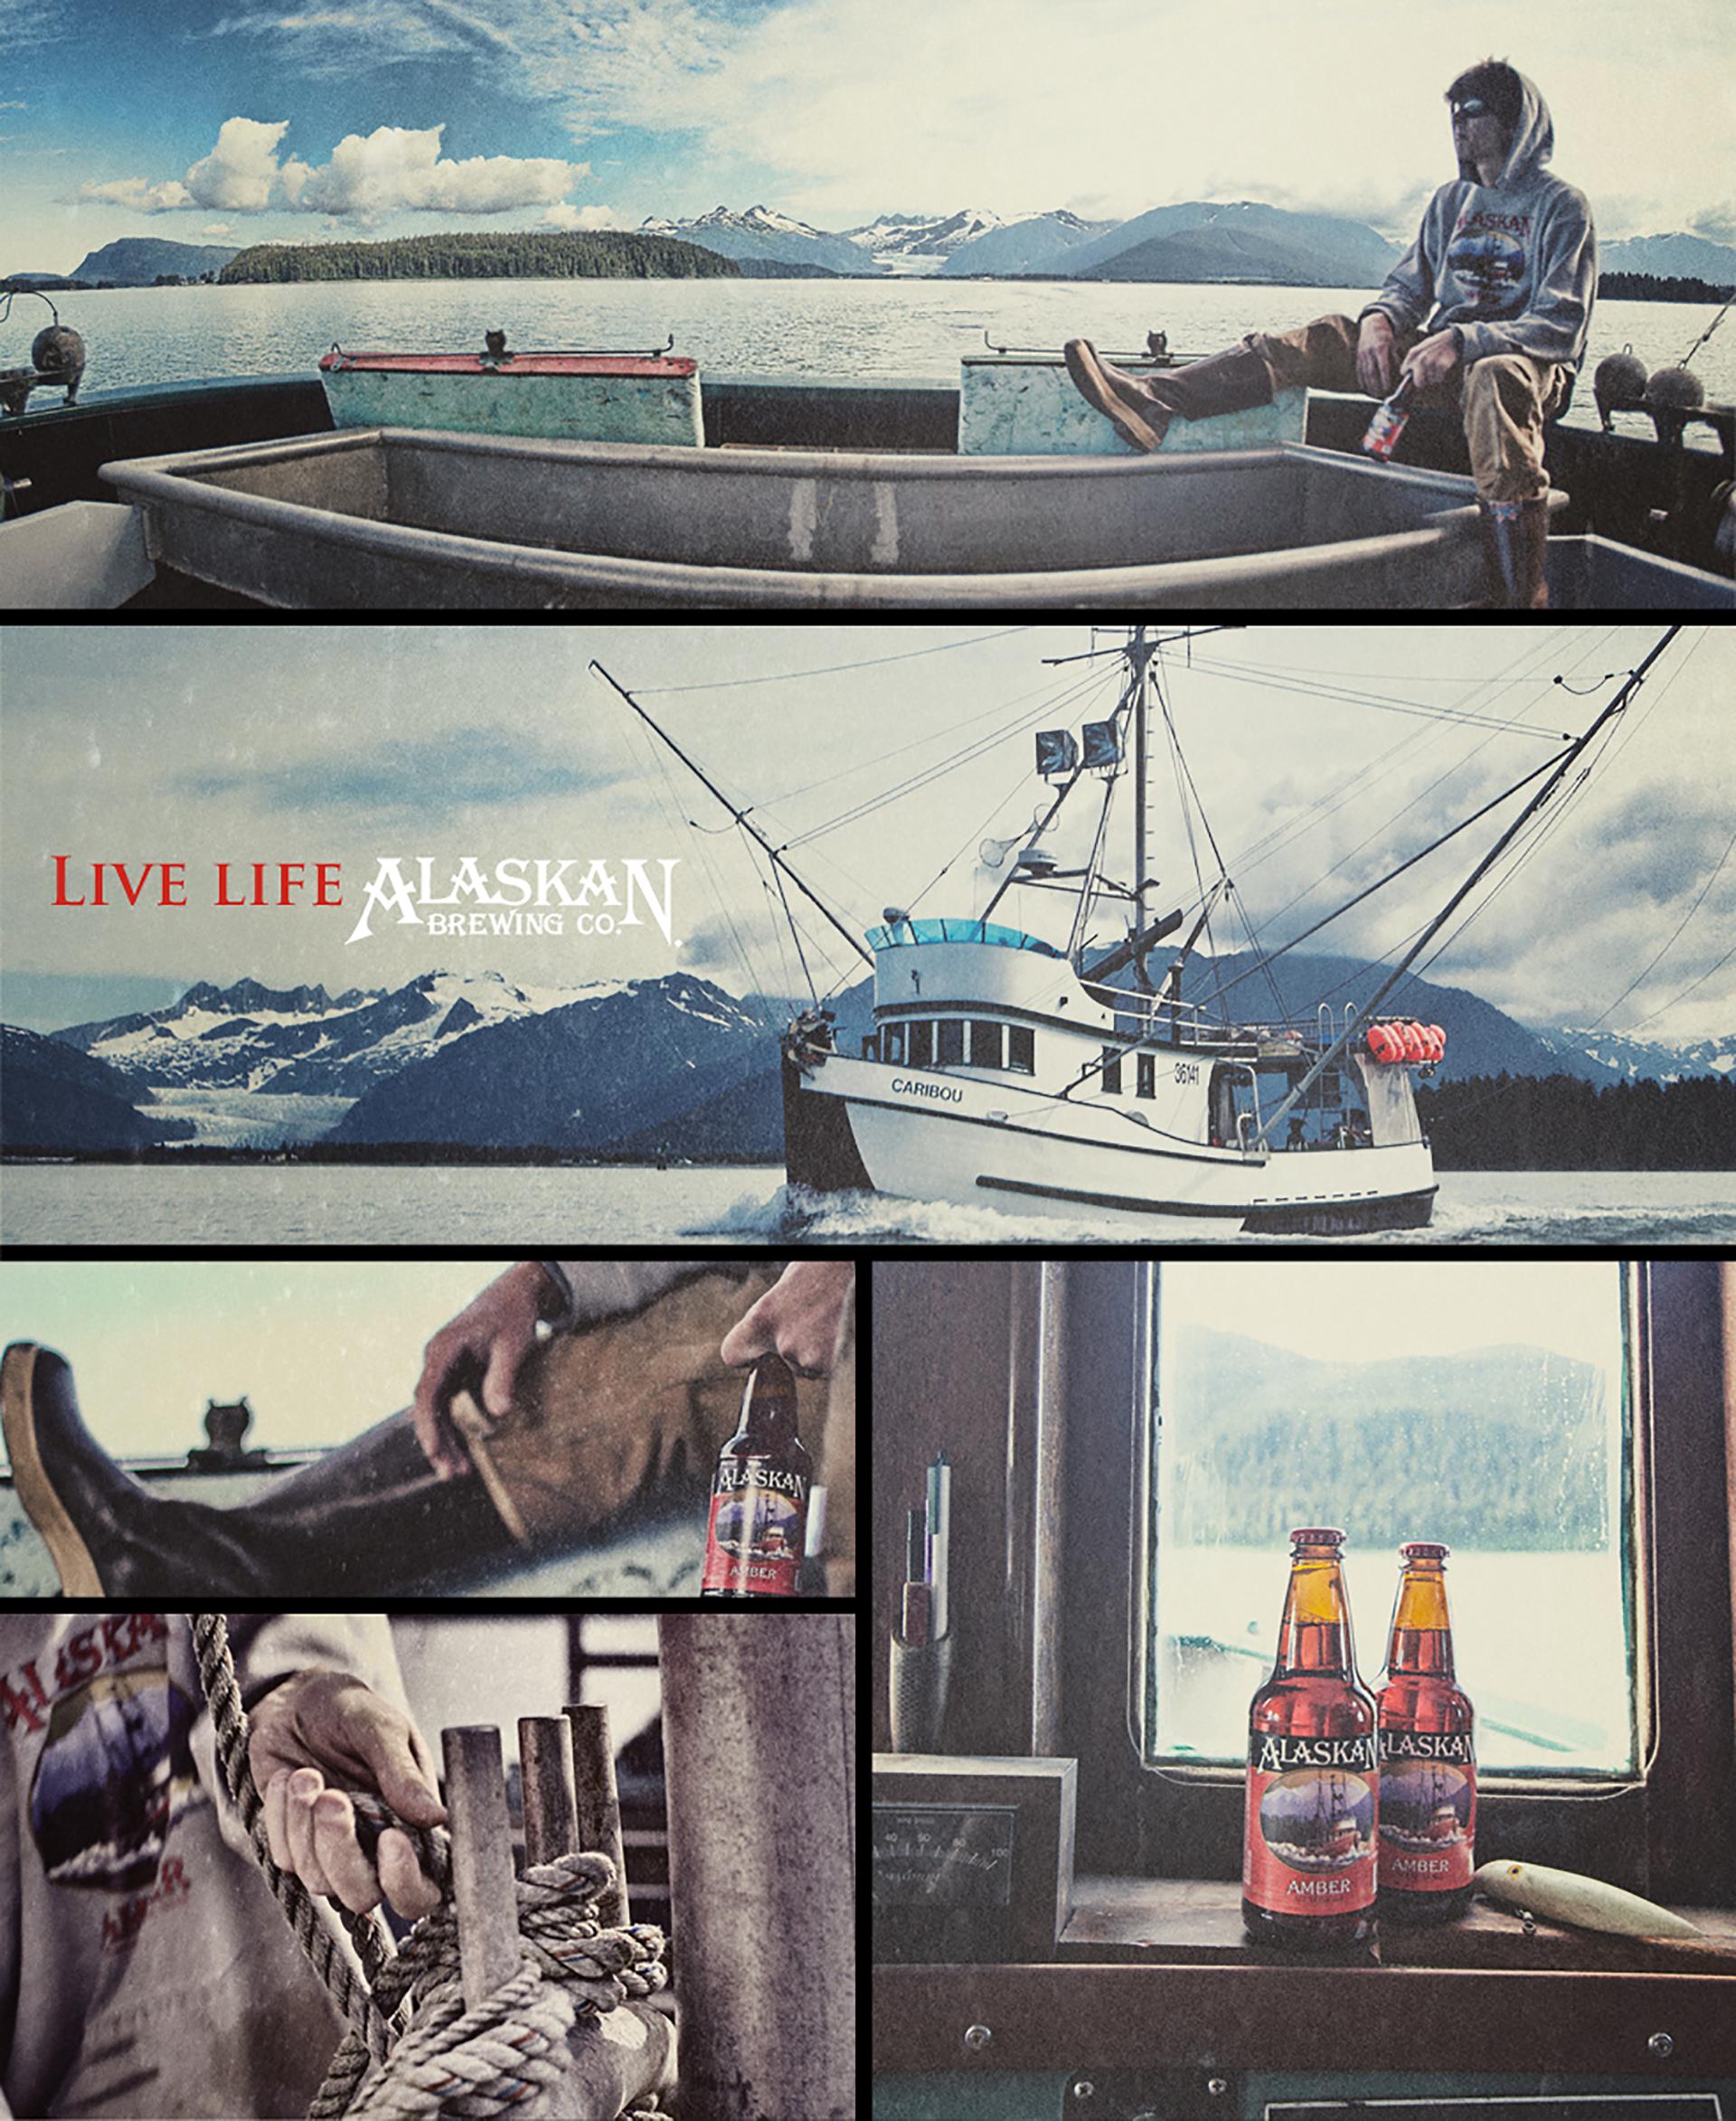 Redtail-AlaskanBC-Ads-011.jpg